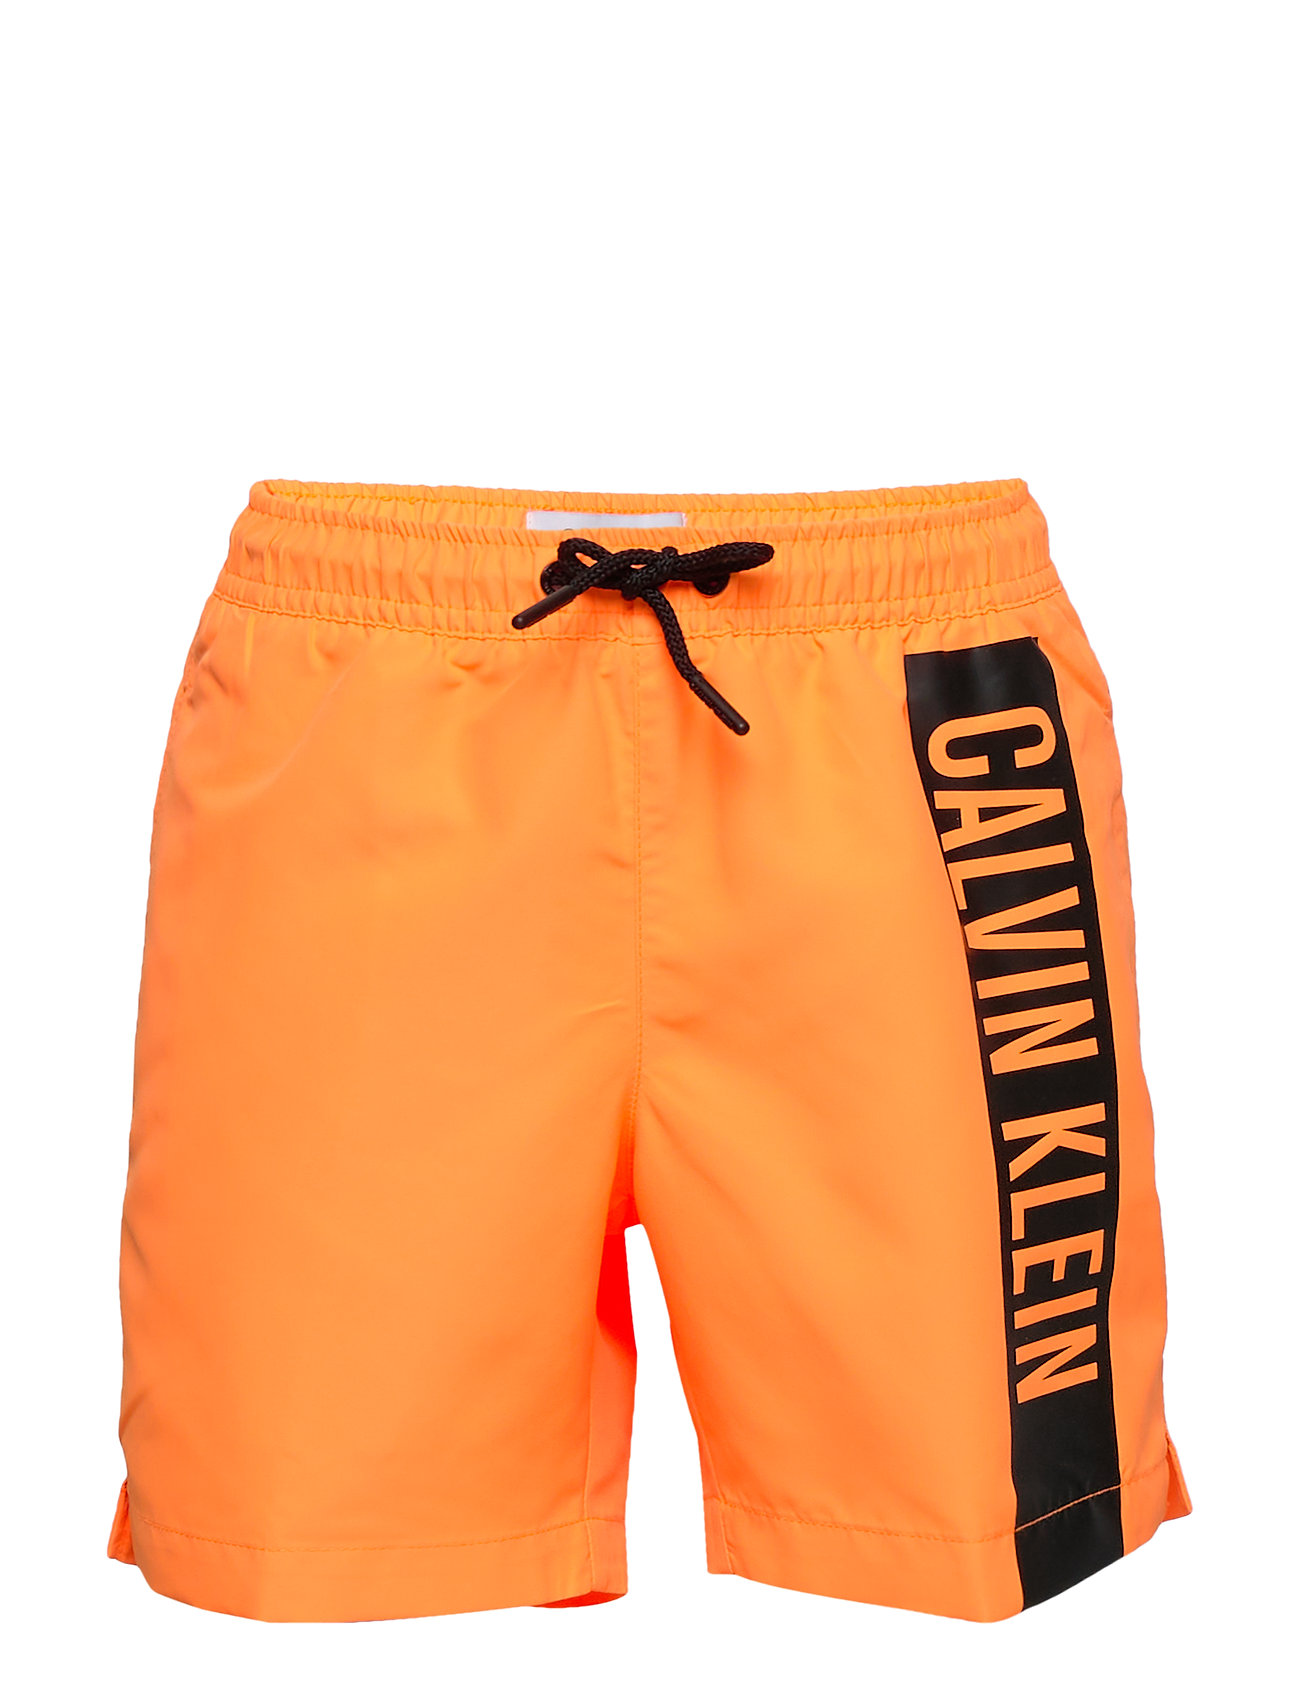 Calvin Klein MEDIUM DRAWSTRING - ORANGE POP